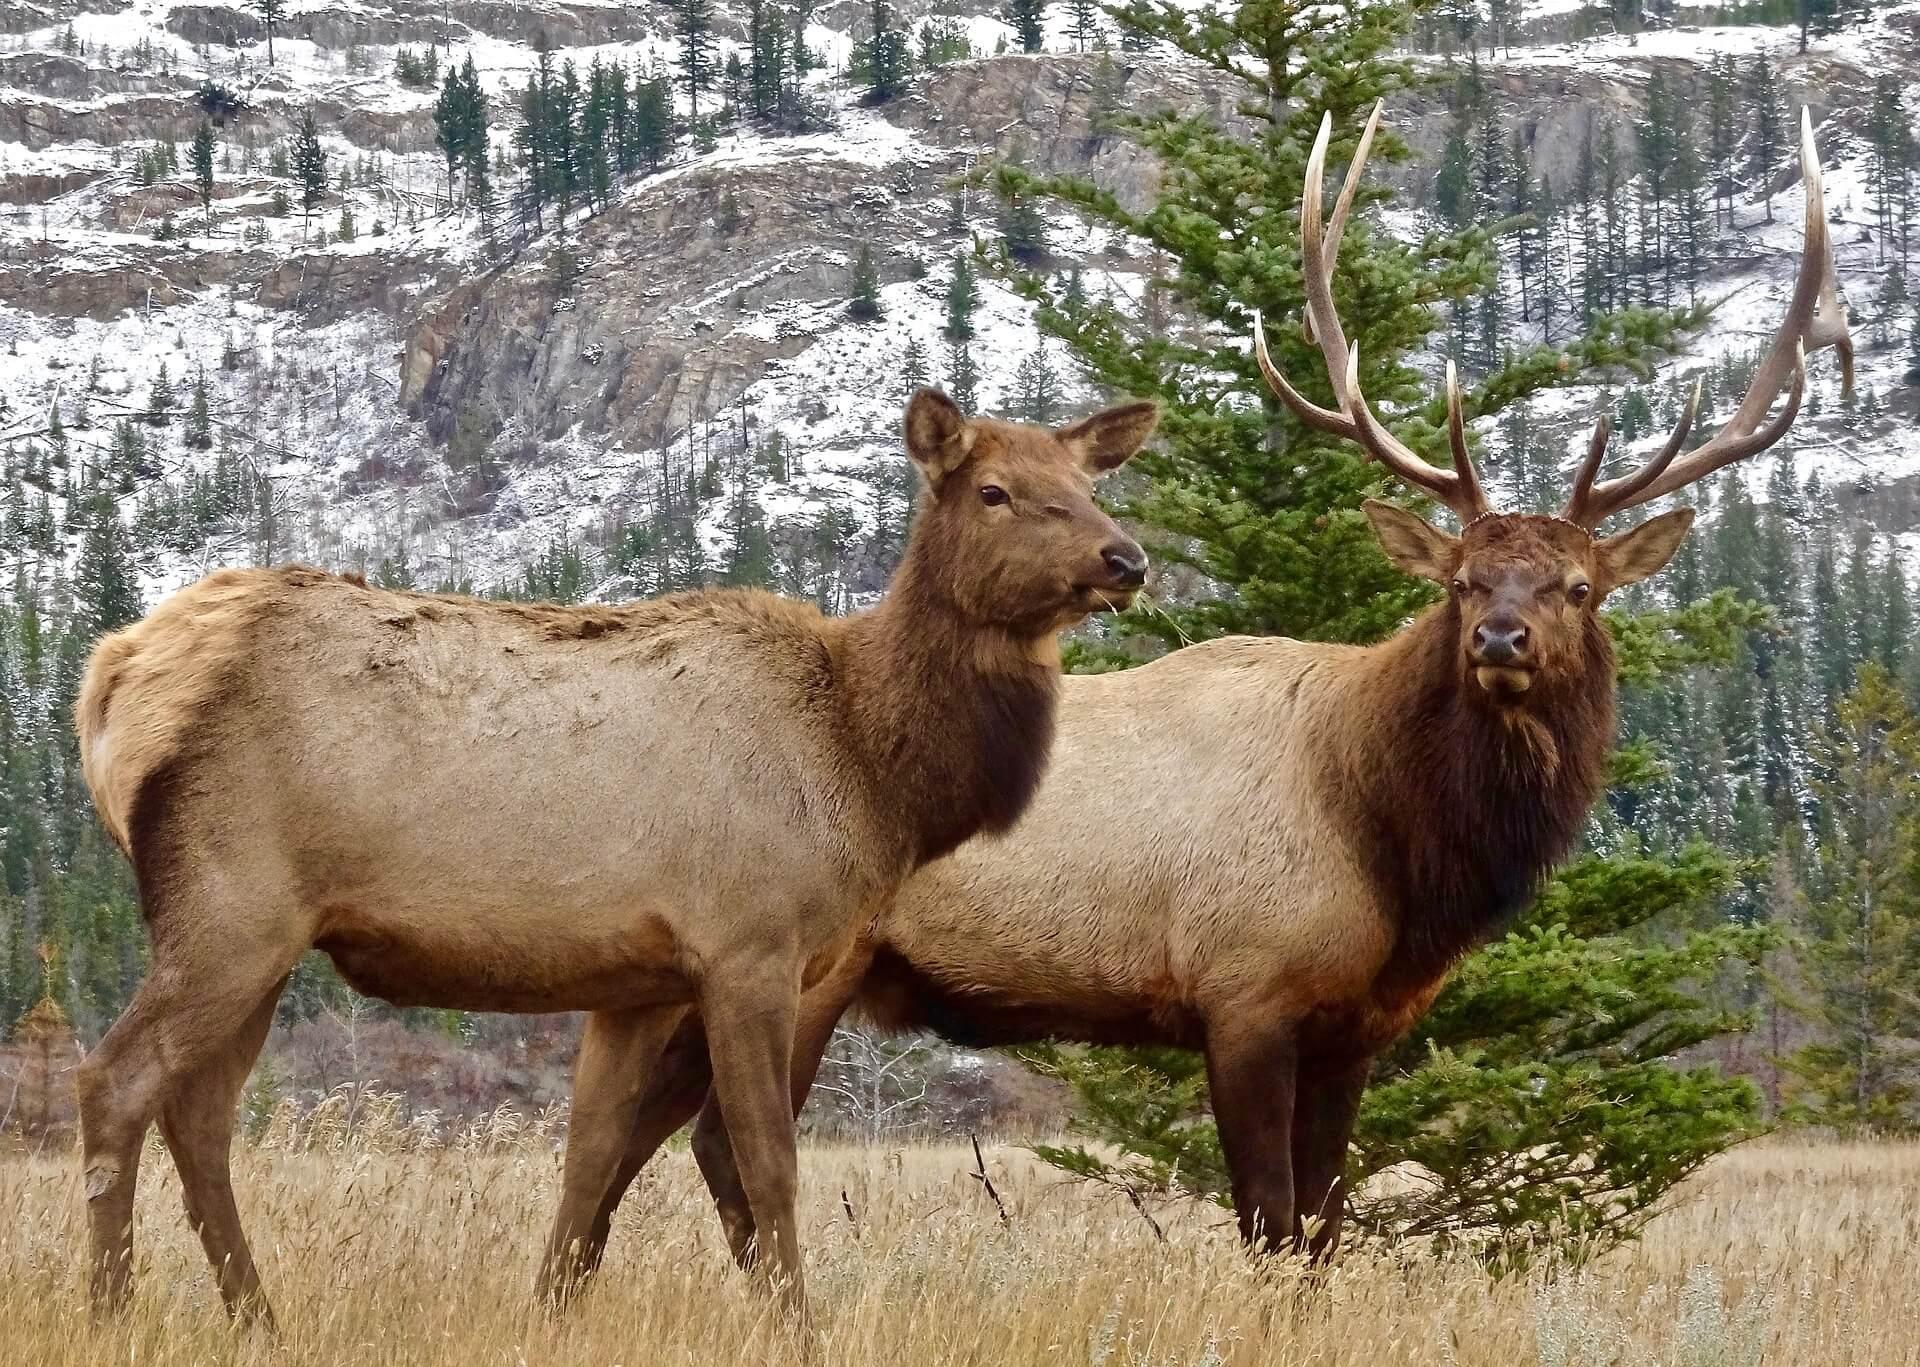 The Rocky Mountain Elk Foundation